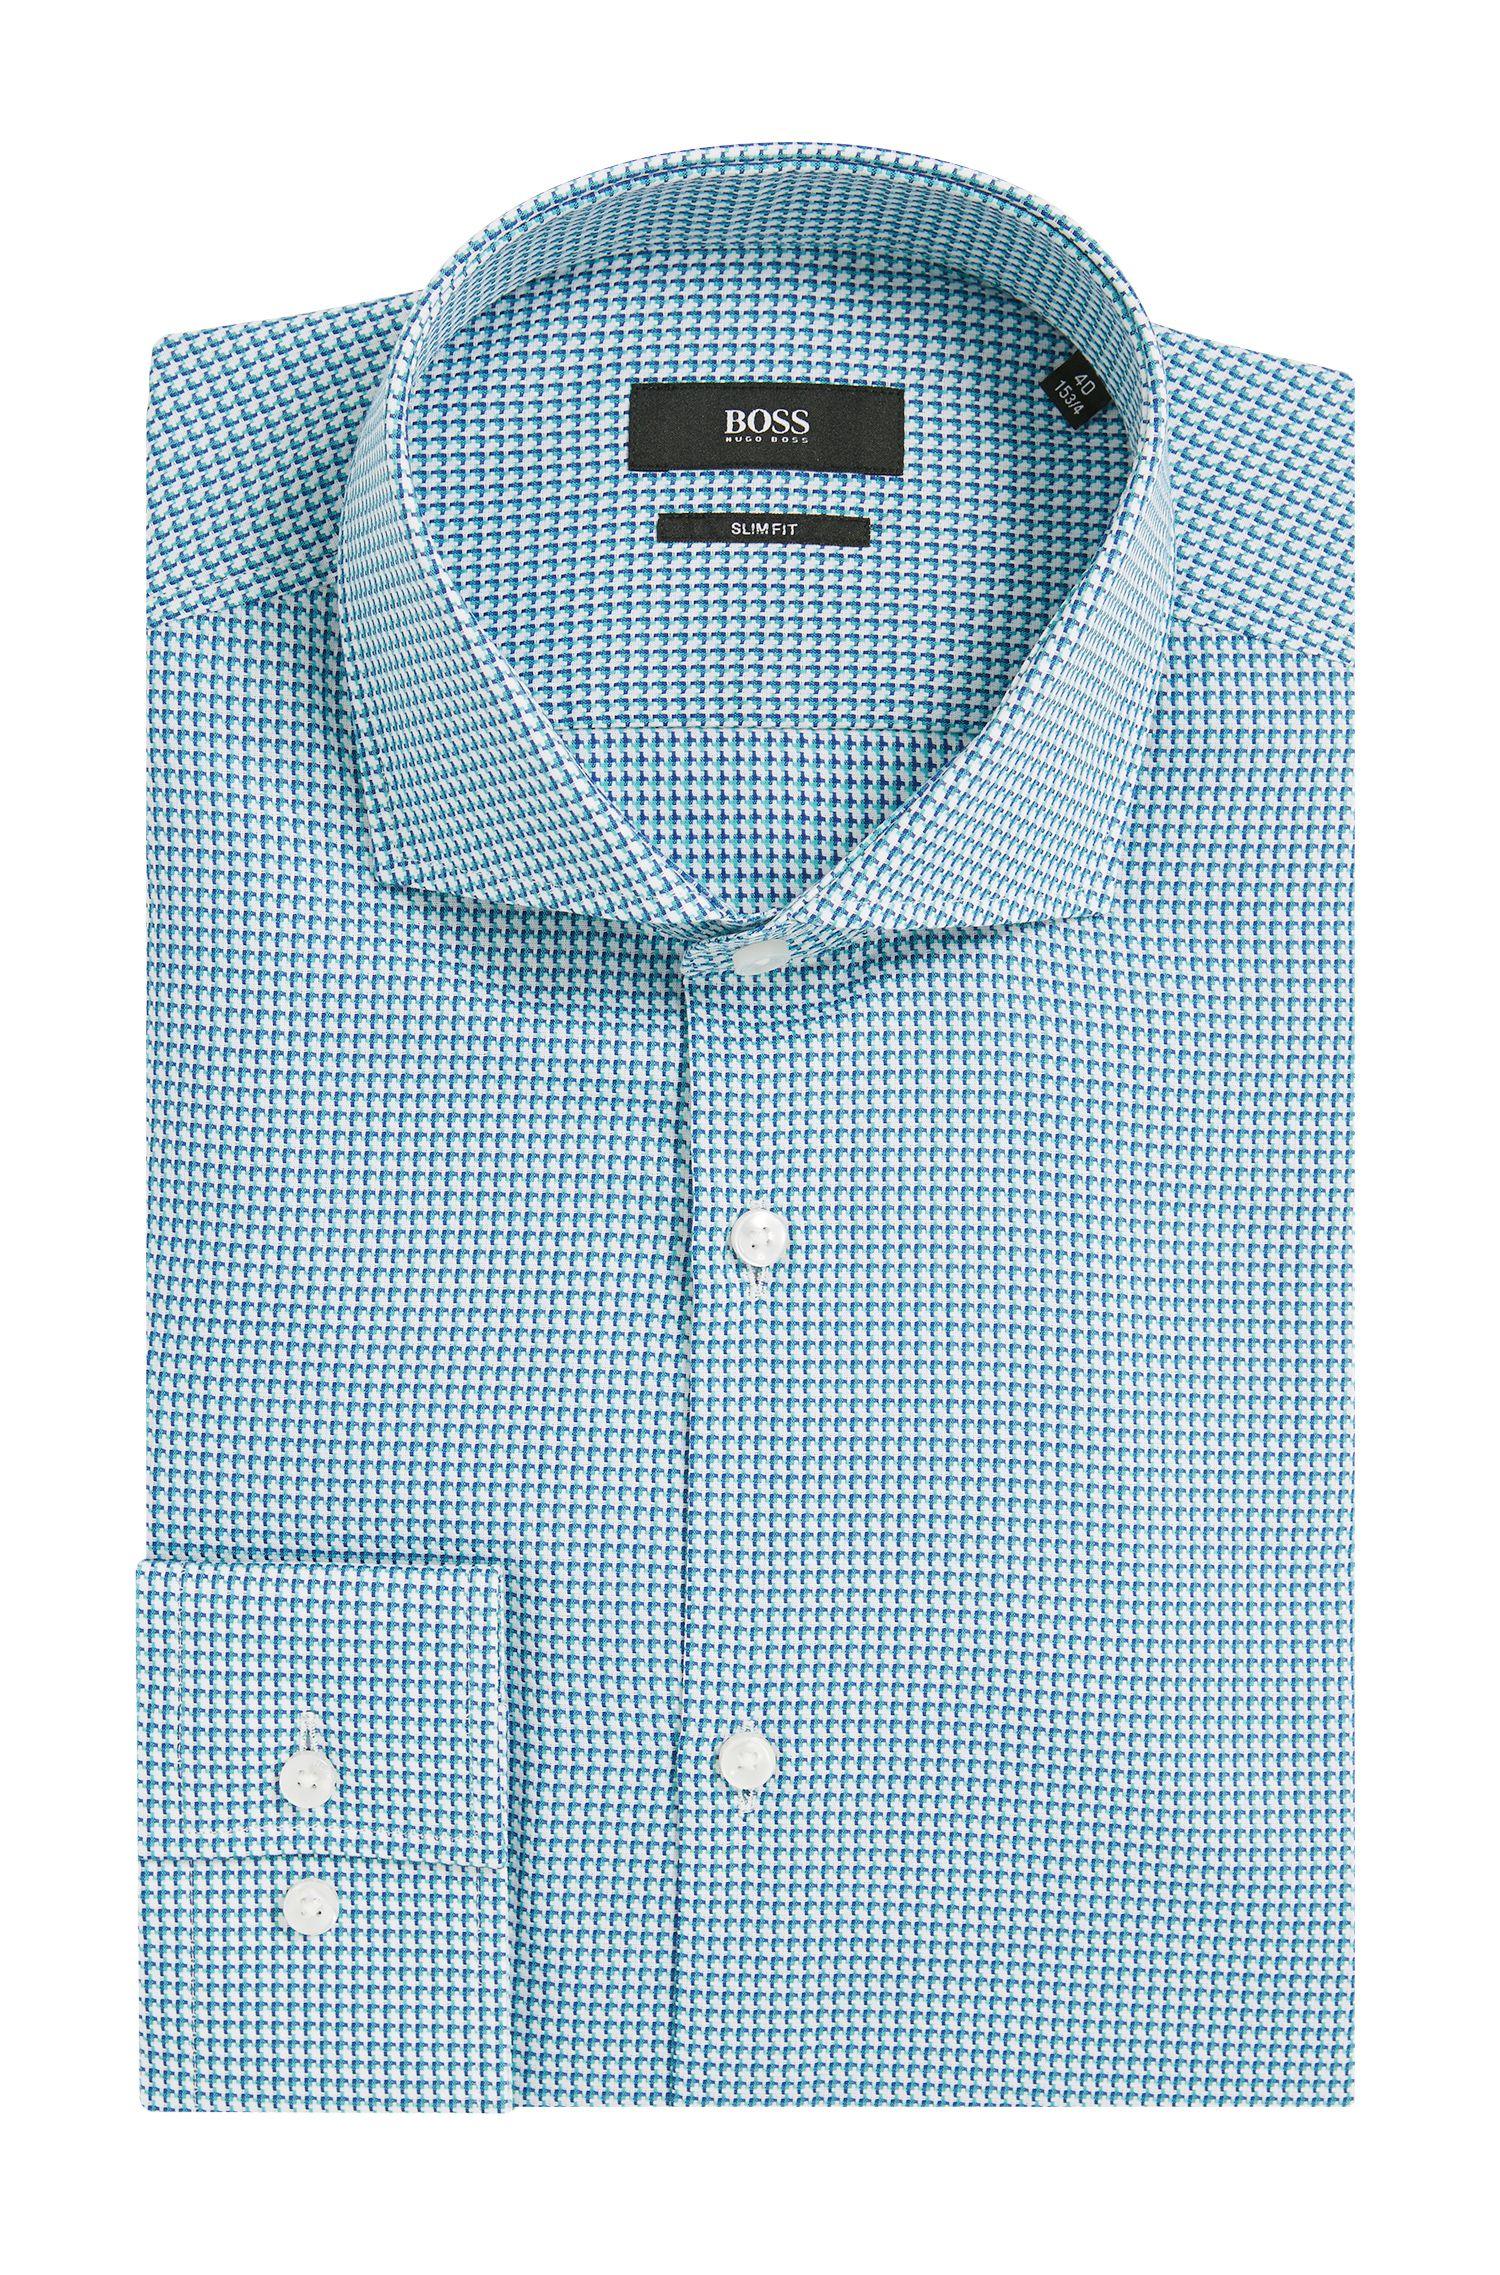 Houndstooth Cotton Dress Shirt, Slim Fit | Jason